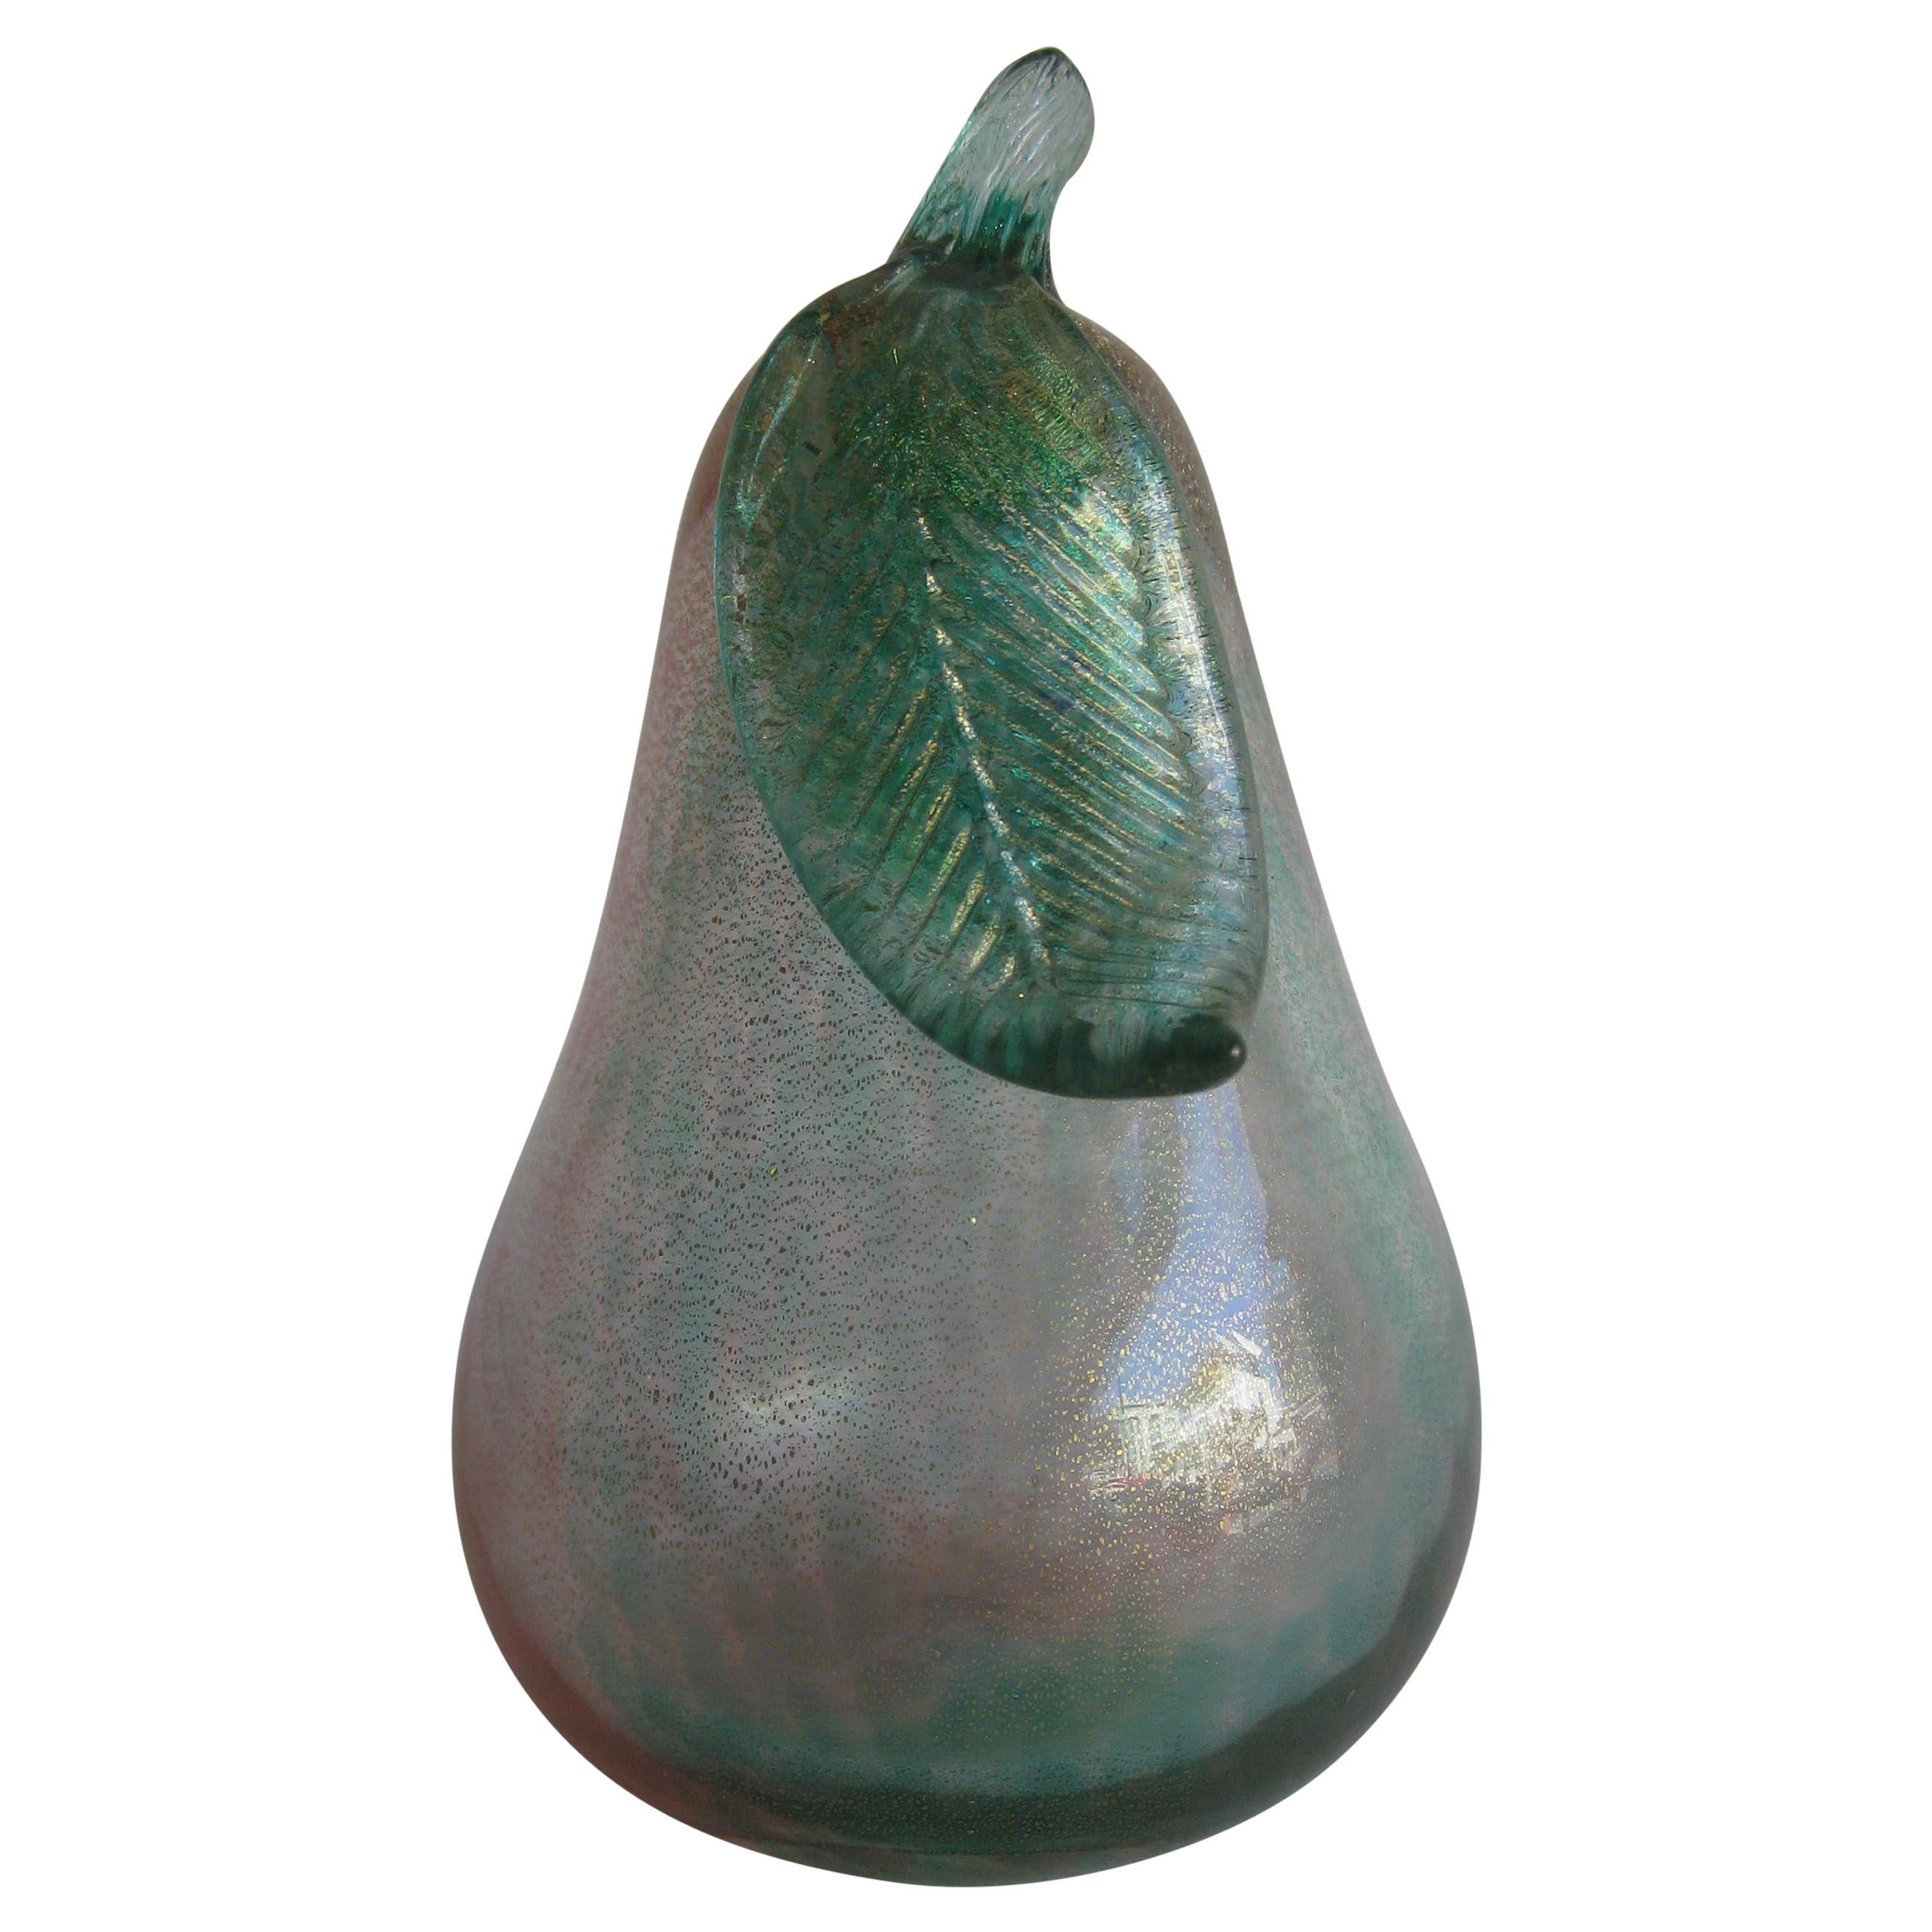 Venetian Murano Art Glass Pink and Green Figural Fruit Pear by Alfredo Barbini